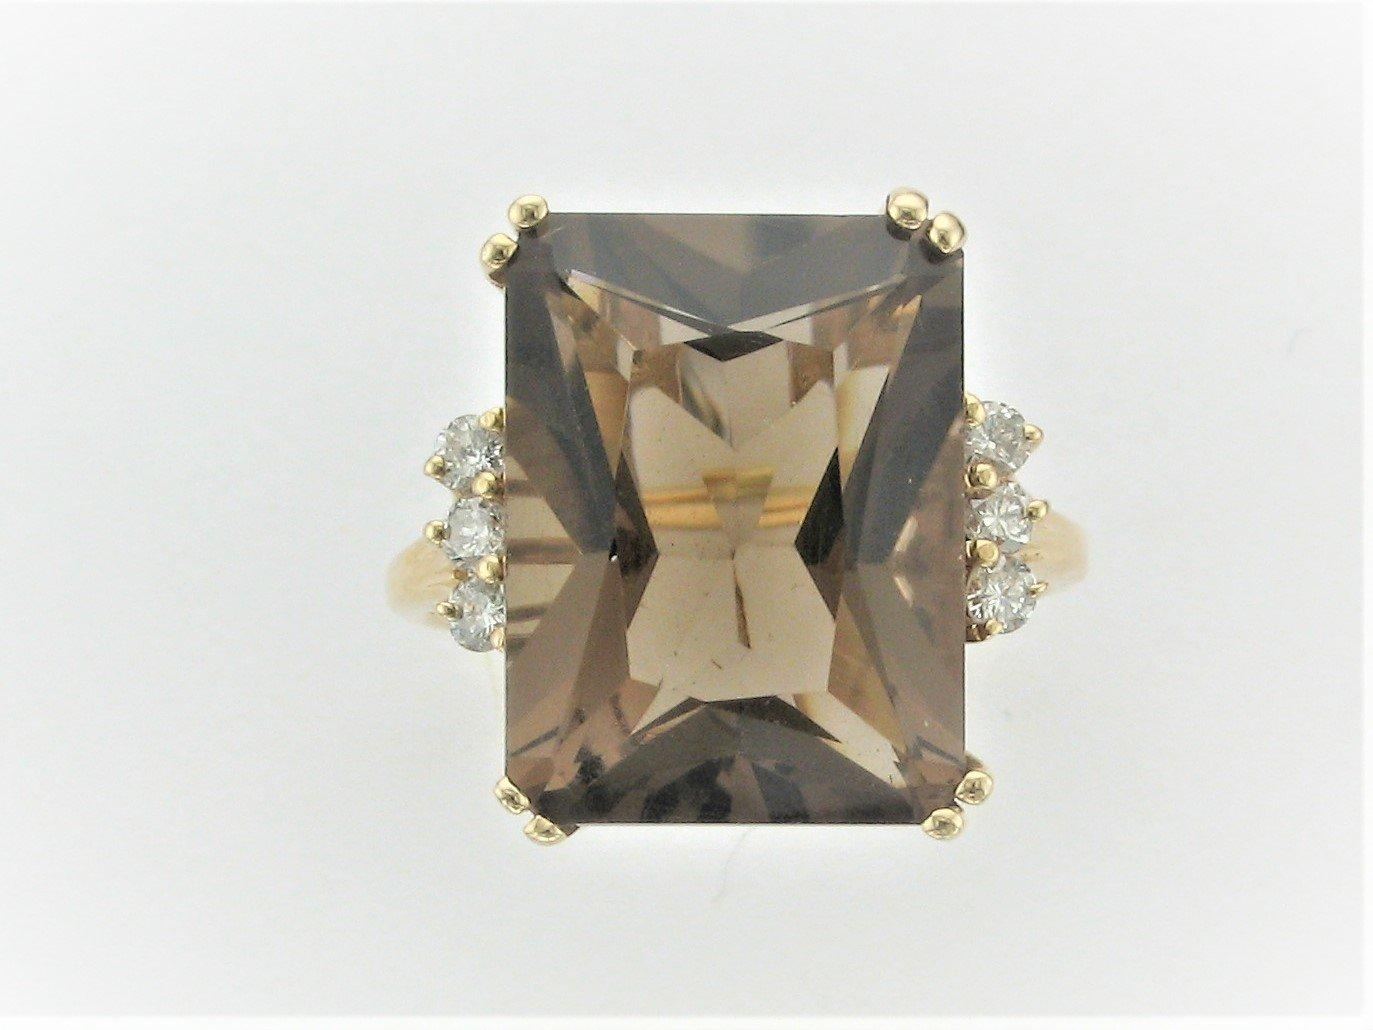 10.5 Carat Smoky Quartz and Diamond Ring Set in 14 Karat Yellow Gold